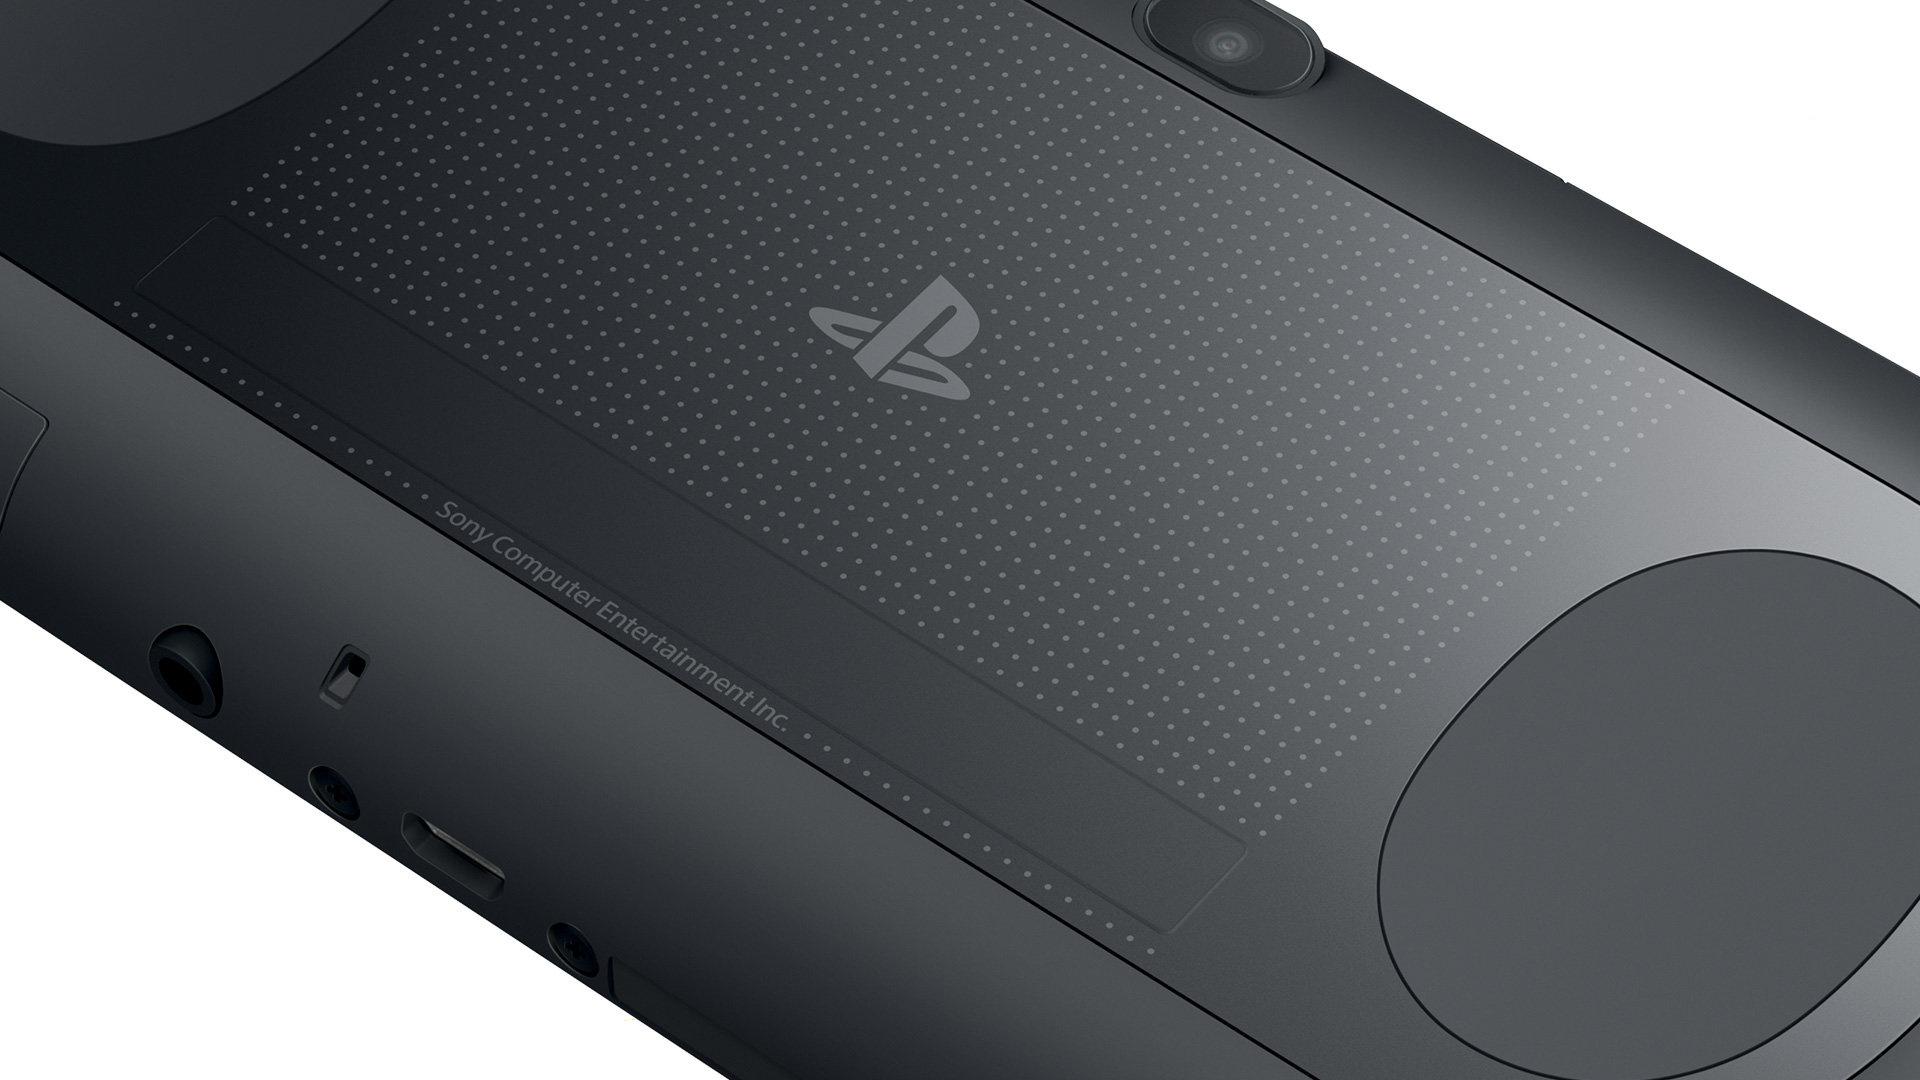 Soapbox: PS Vita's Longevity Has Been Quite Remarkable - Push Square